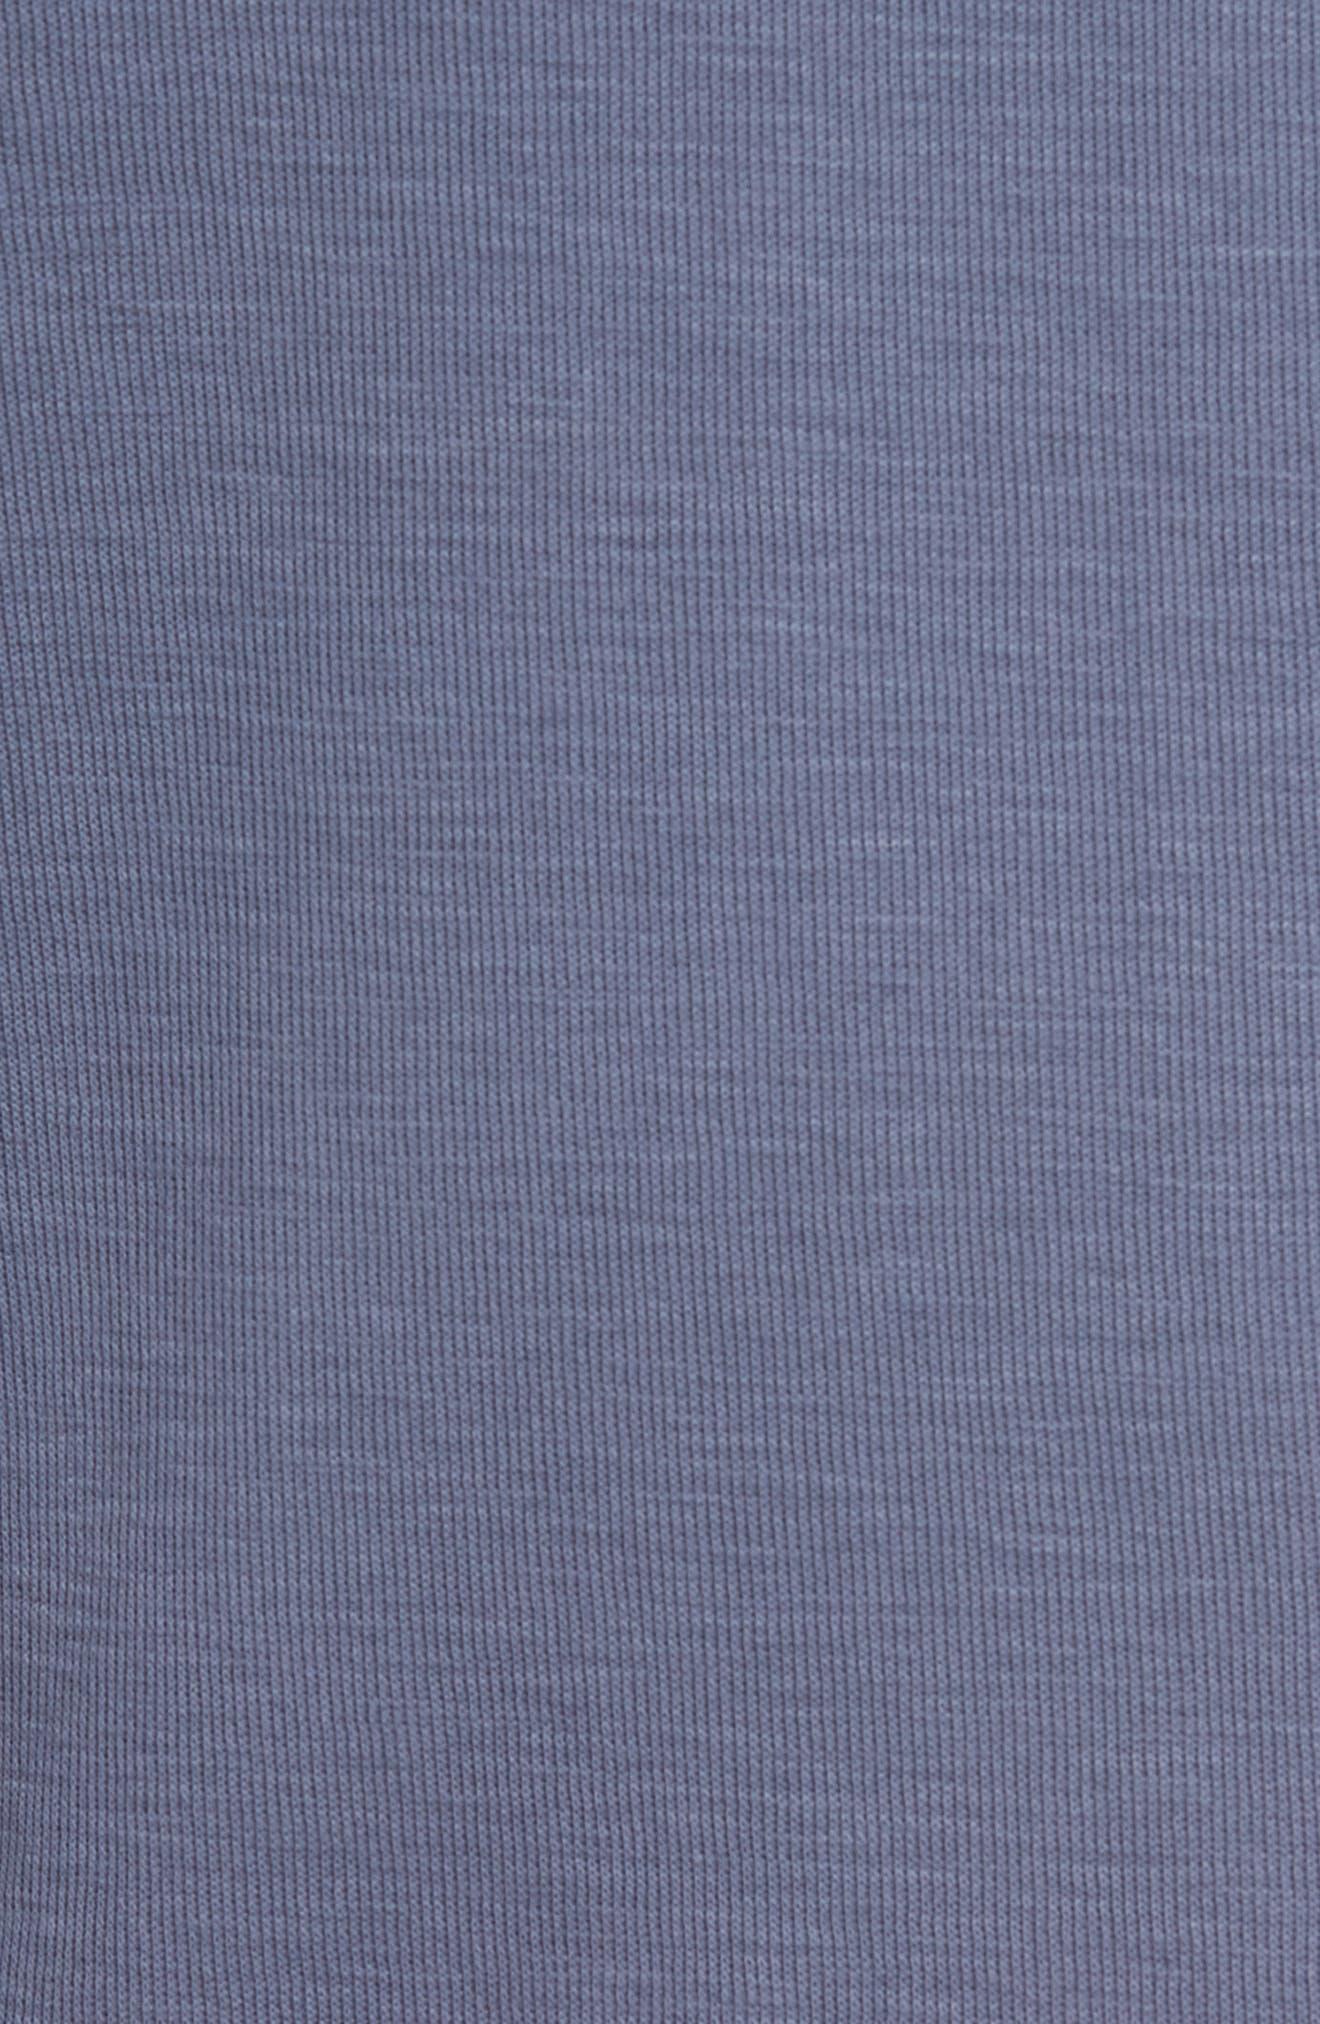 Hans Long Sleeve Henley T-Shirt,                             Alternate thumbnail 5, color,                             014